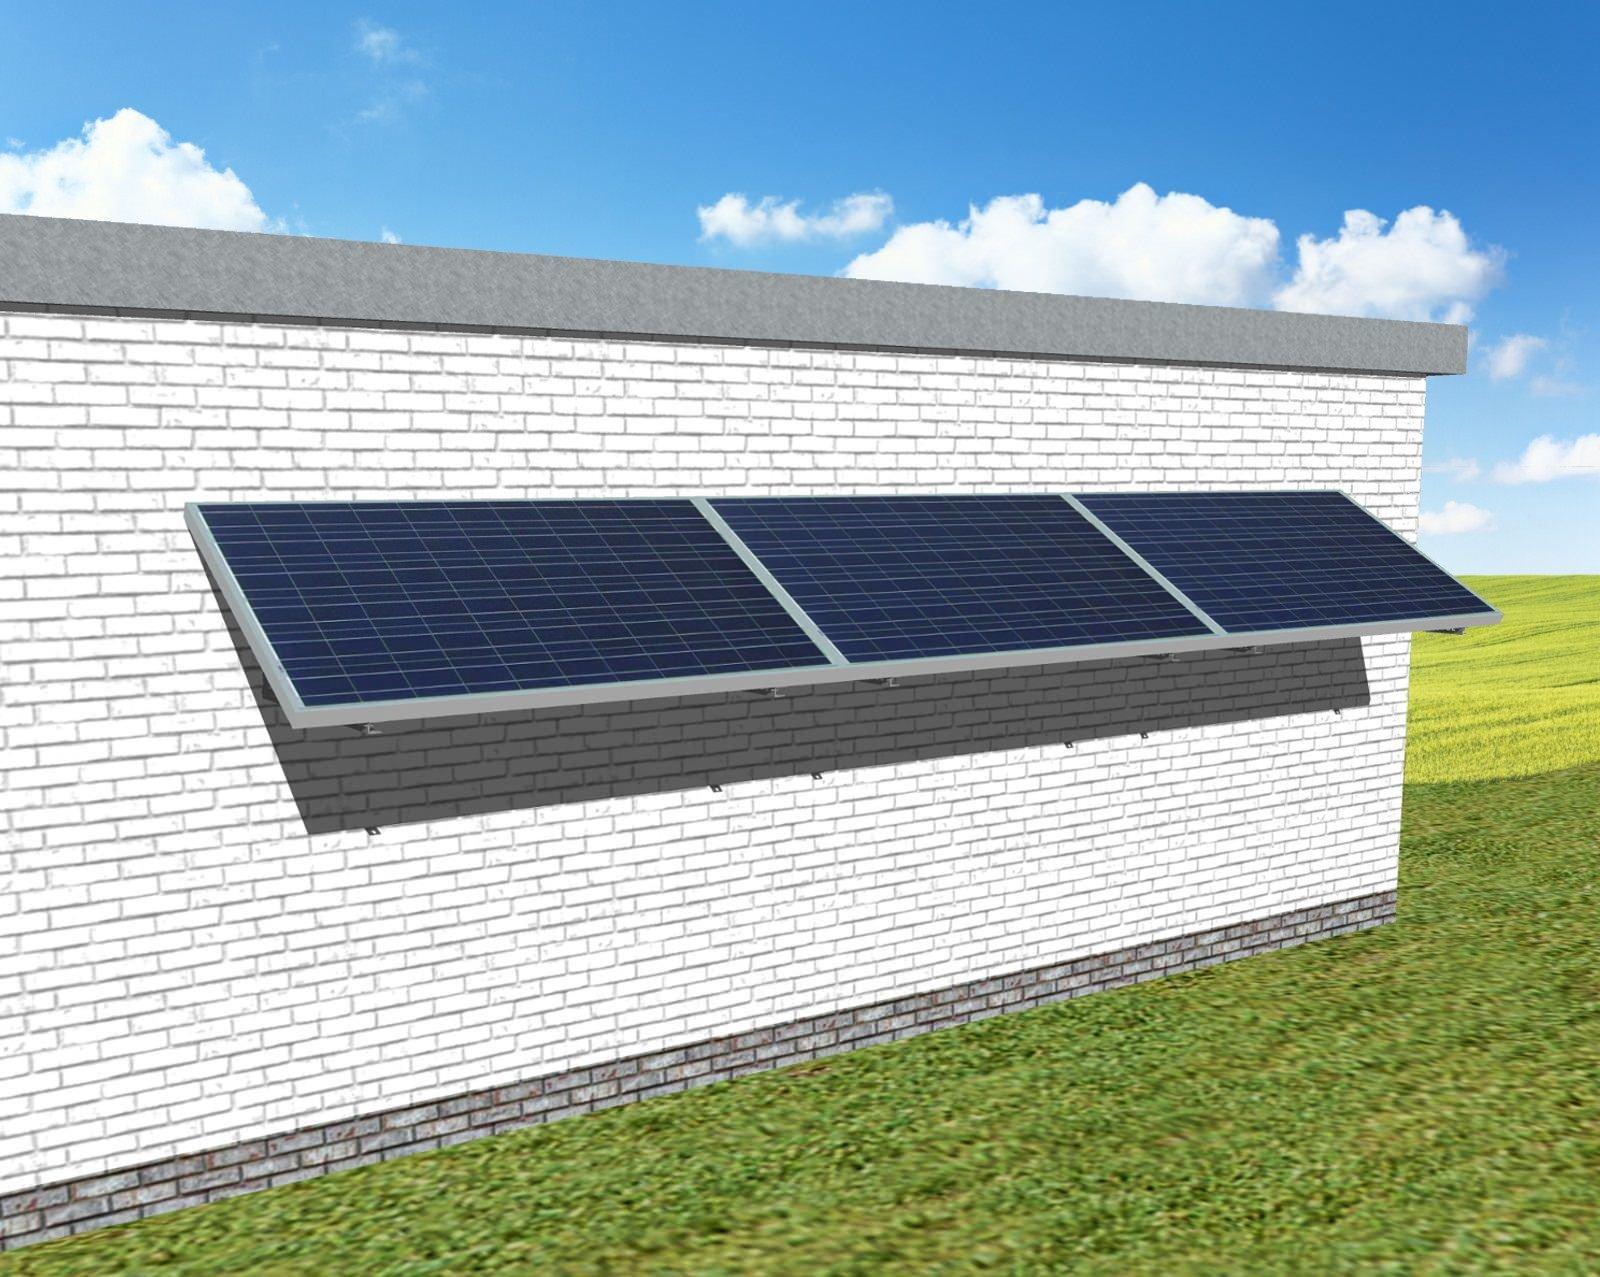 myCleantech-Solar.org Solaranalage Fassade oder Carport mit 3 Pannels